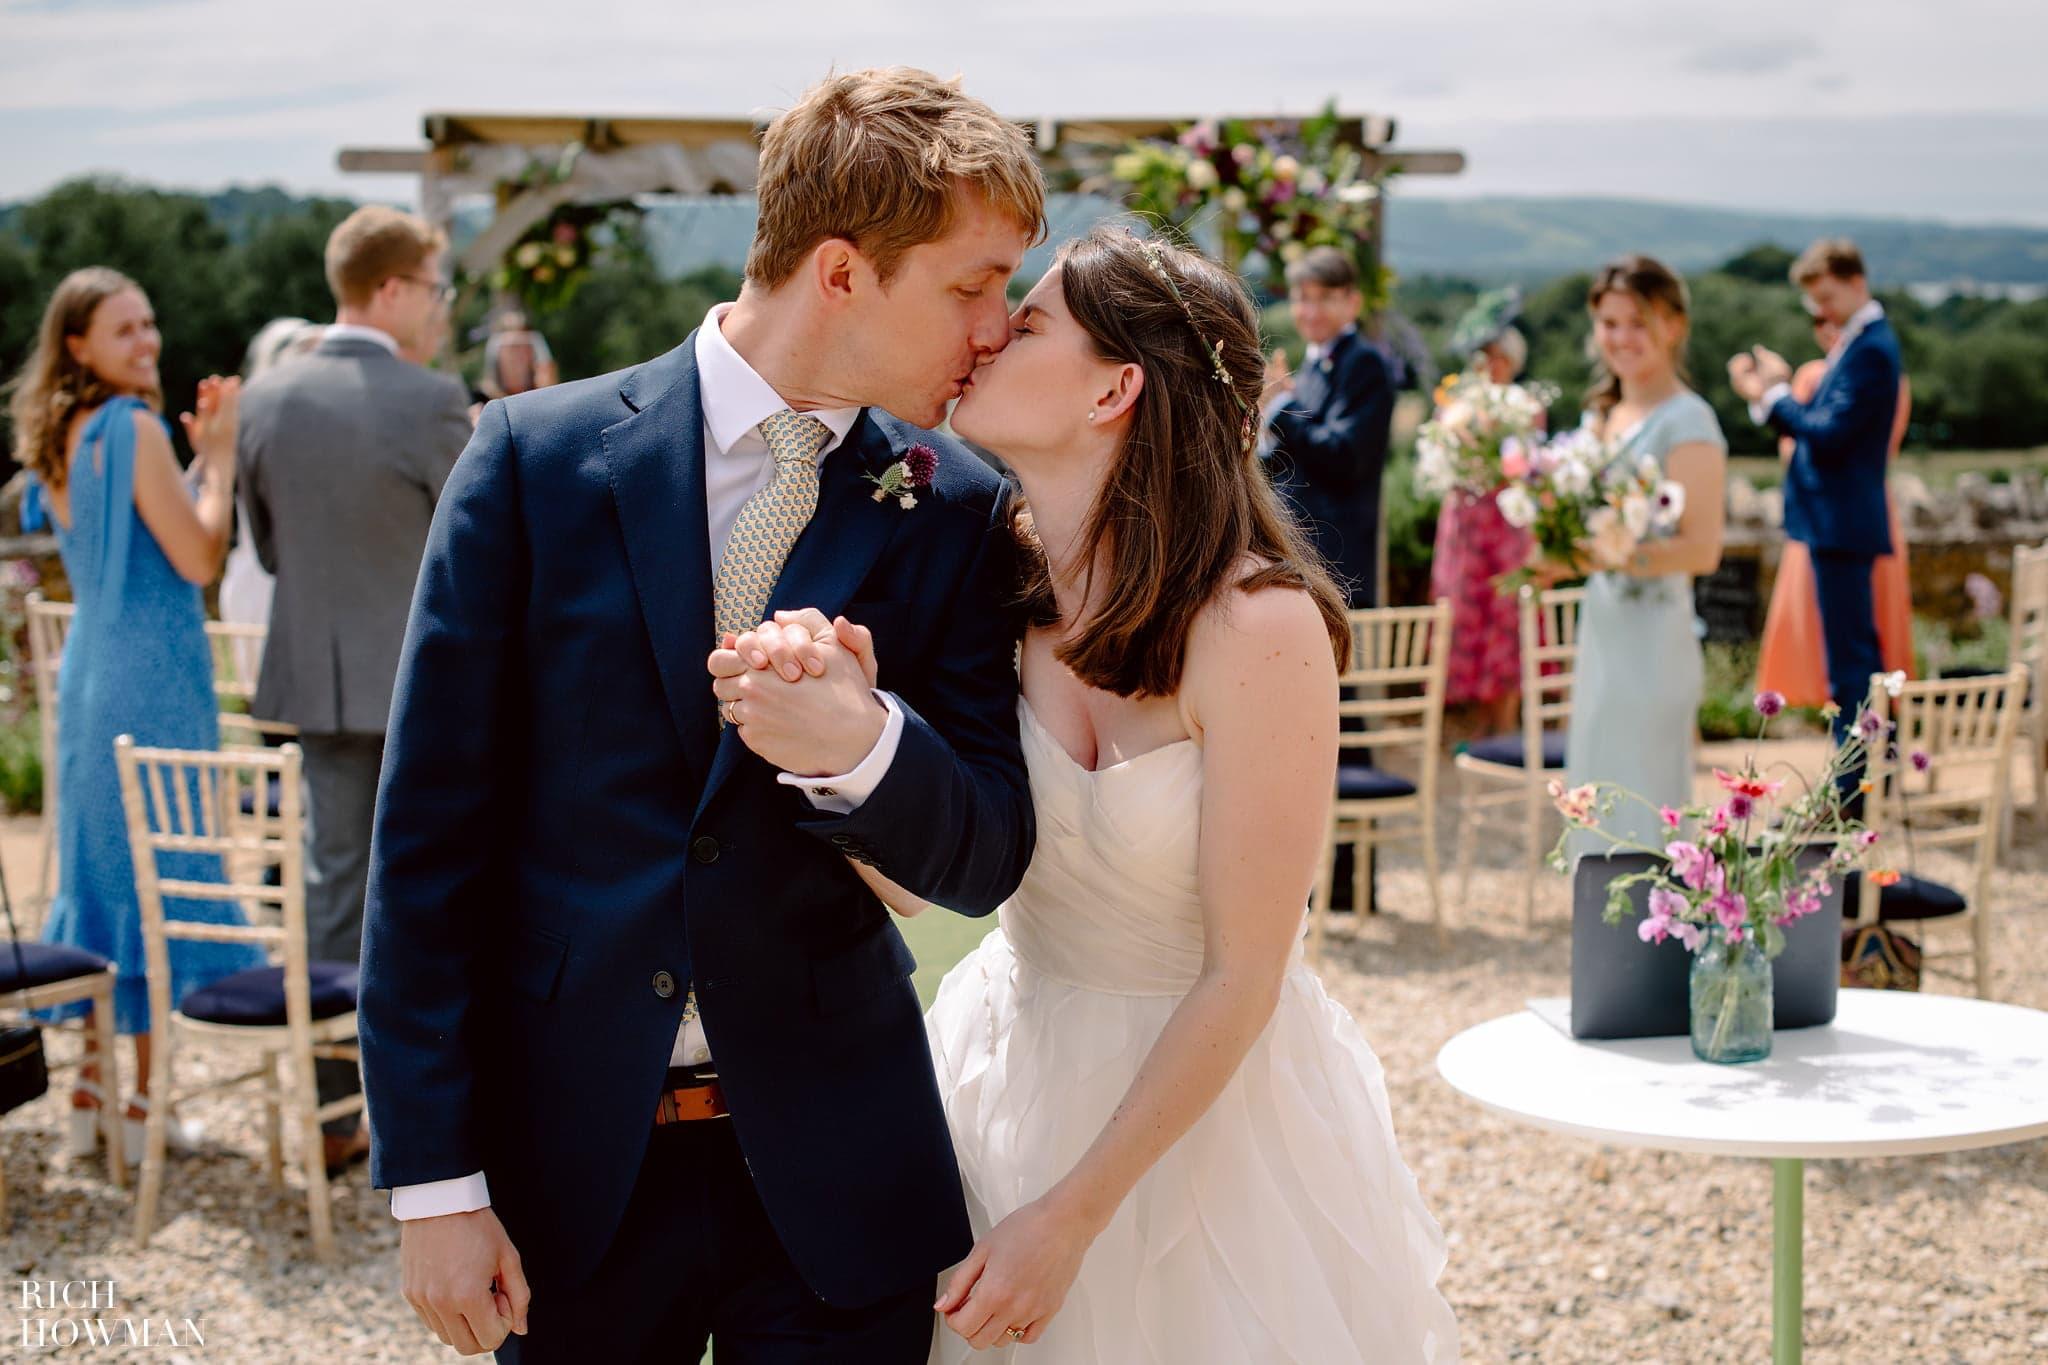 Lockdown Wedding Photographer 19